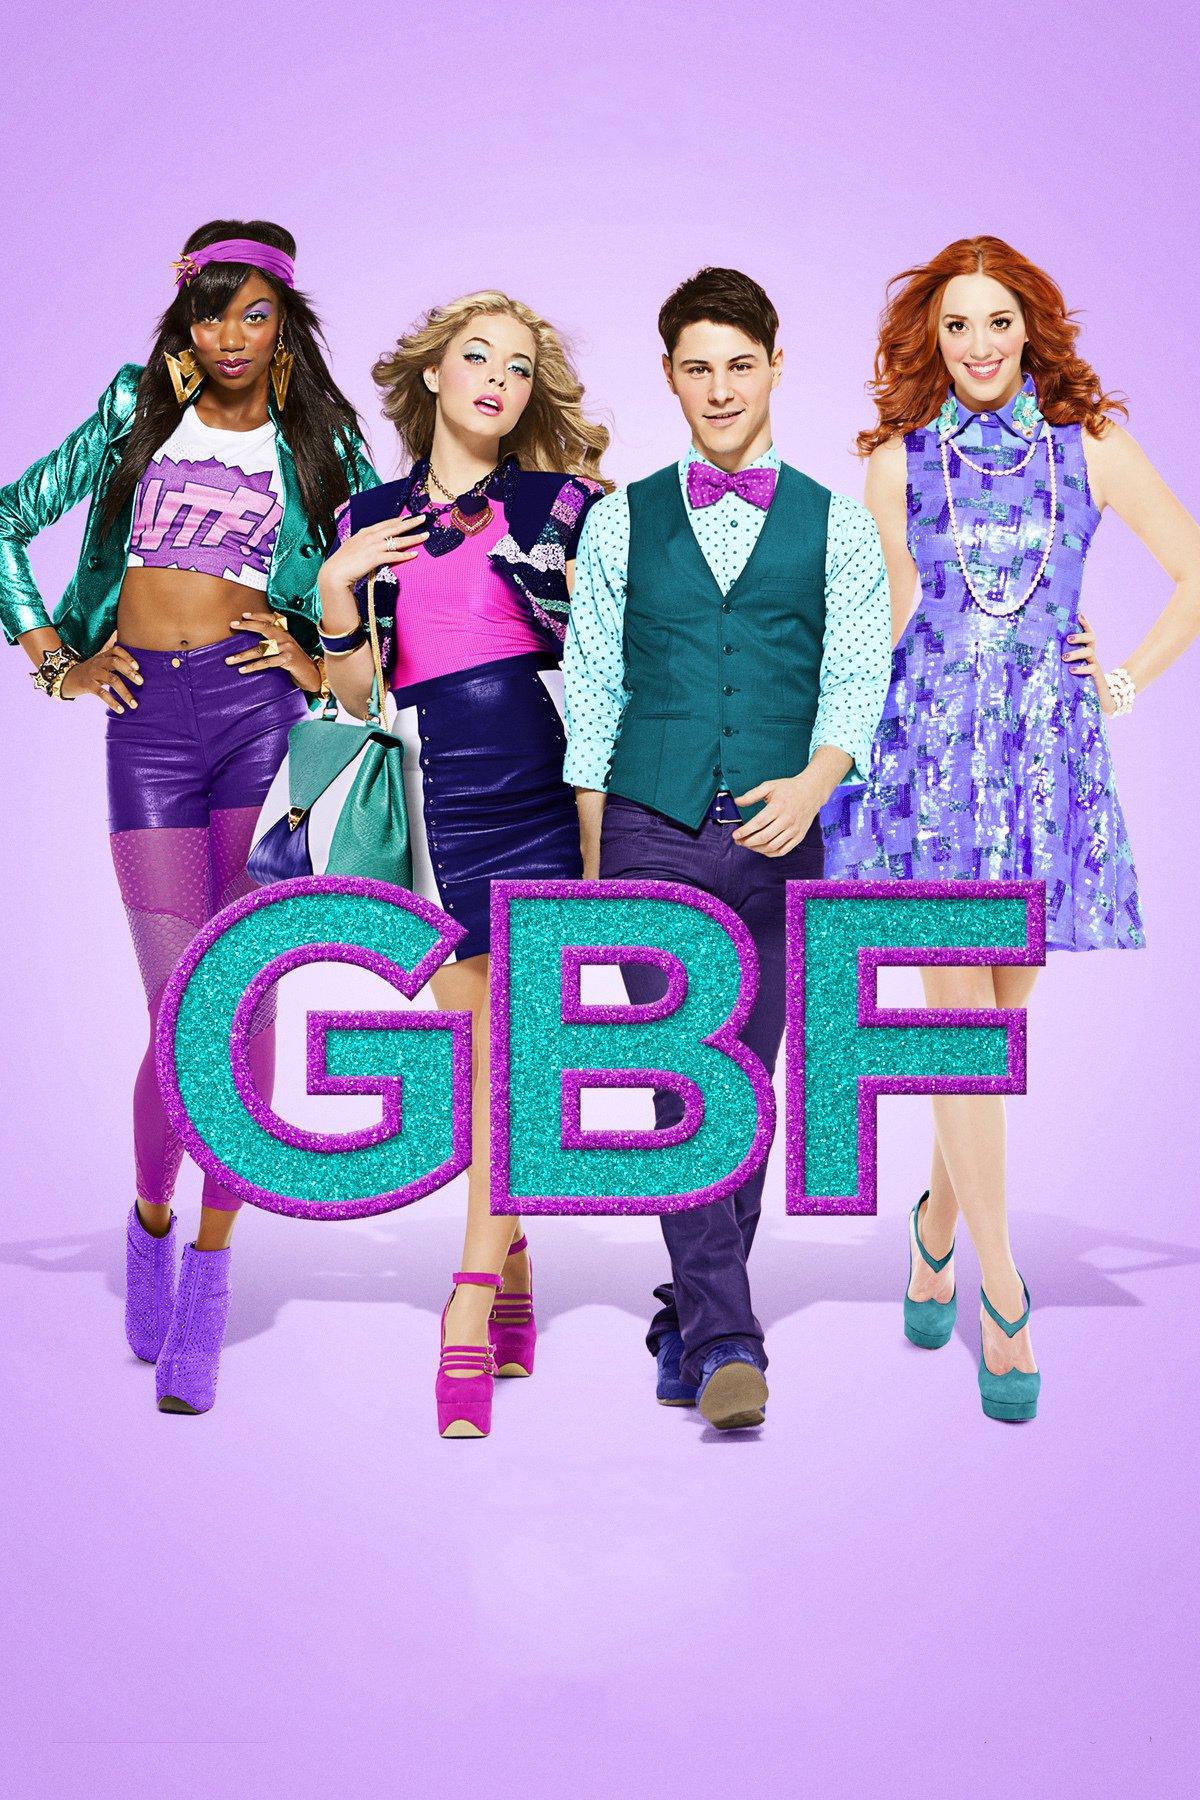 Regarder G.B.F. en streaming gratuit